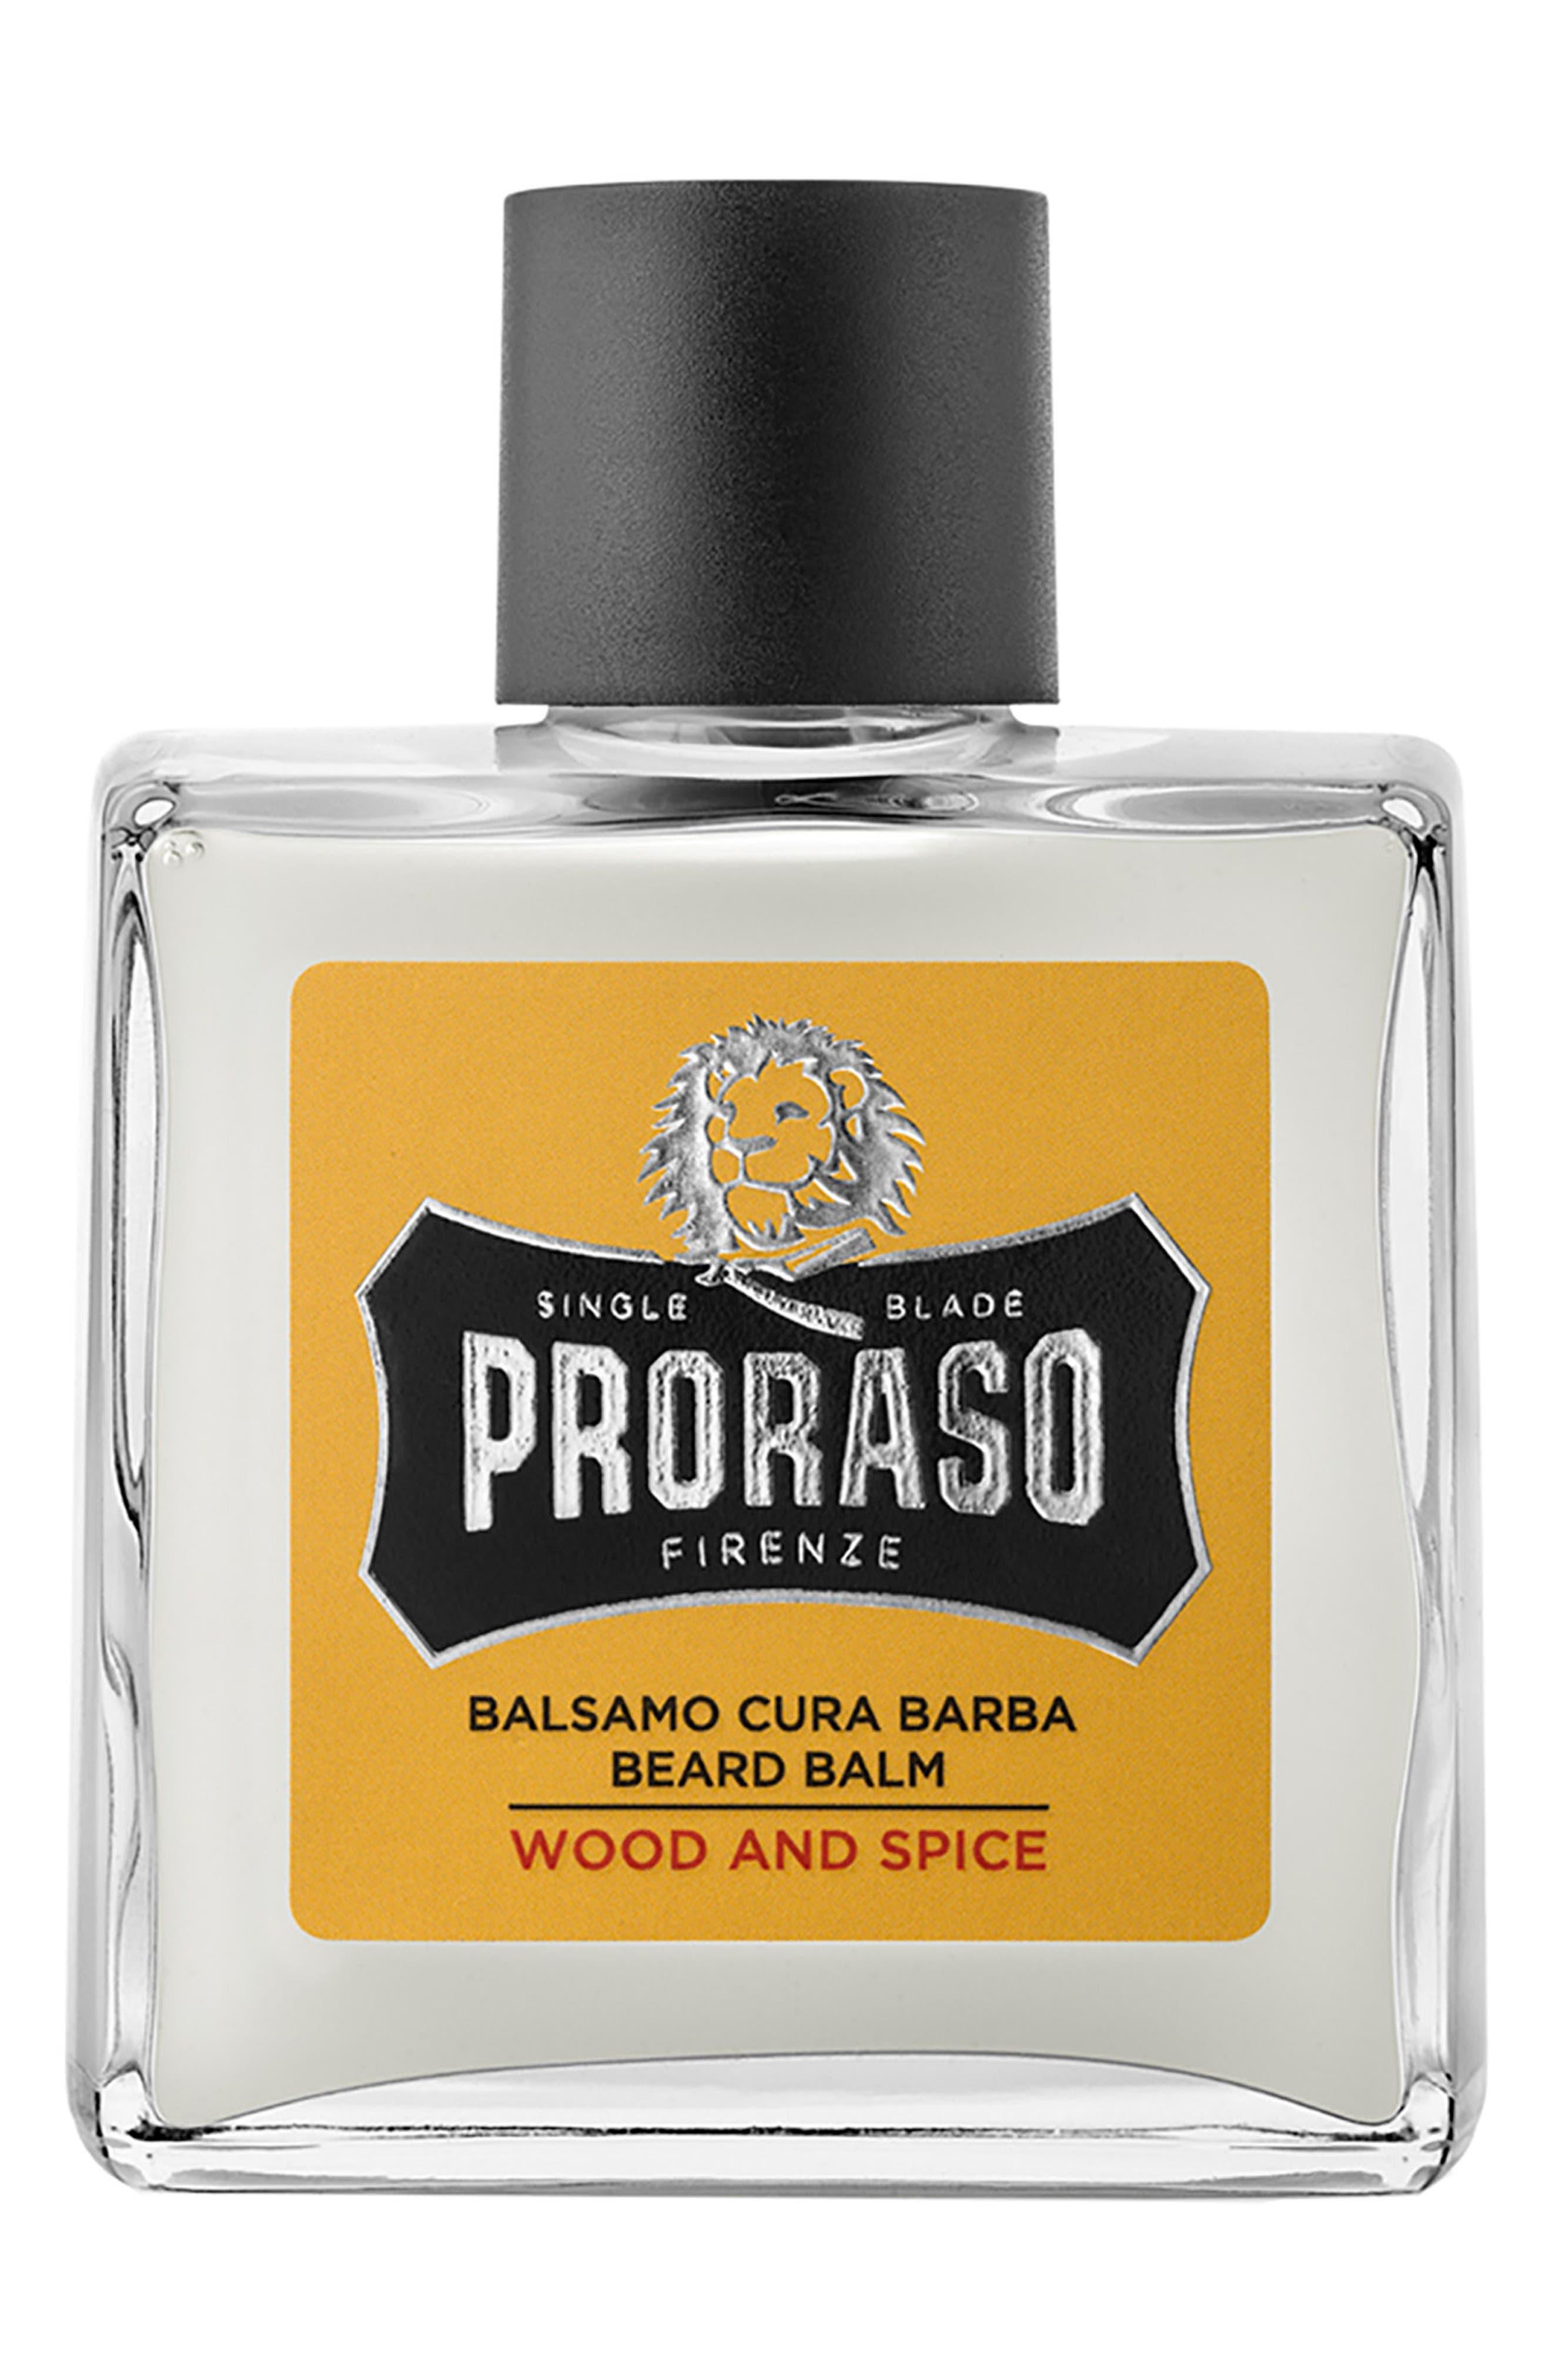 Men's Grooming Wood and Spice Beard Balm,                             Main thumbnail 1, color,                             NO COLOR